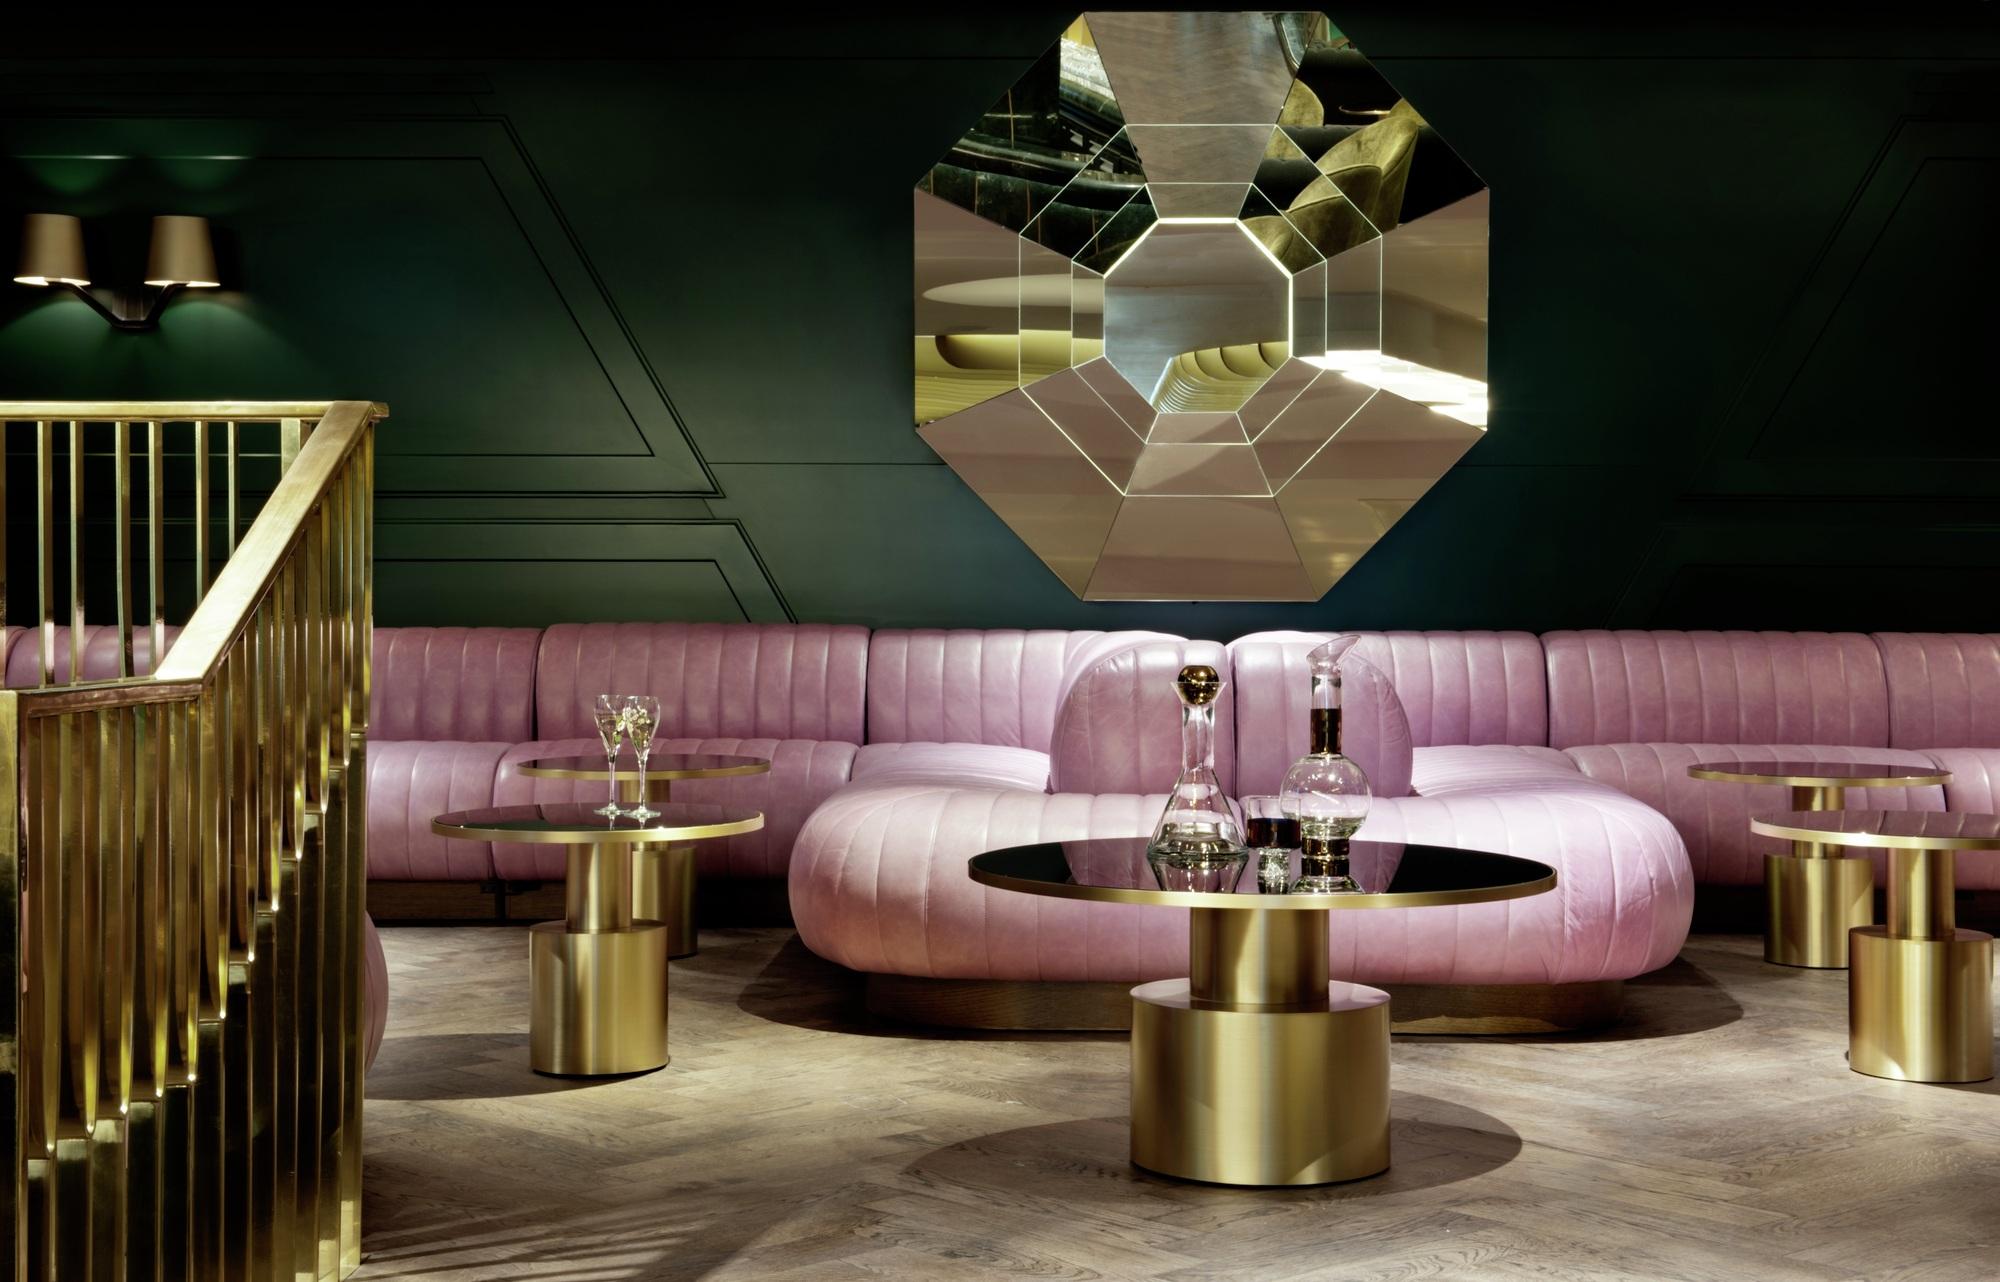 Dandelyan London Design Research Studio Image Courtesy Of The Restaurant Bar